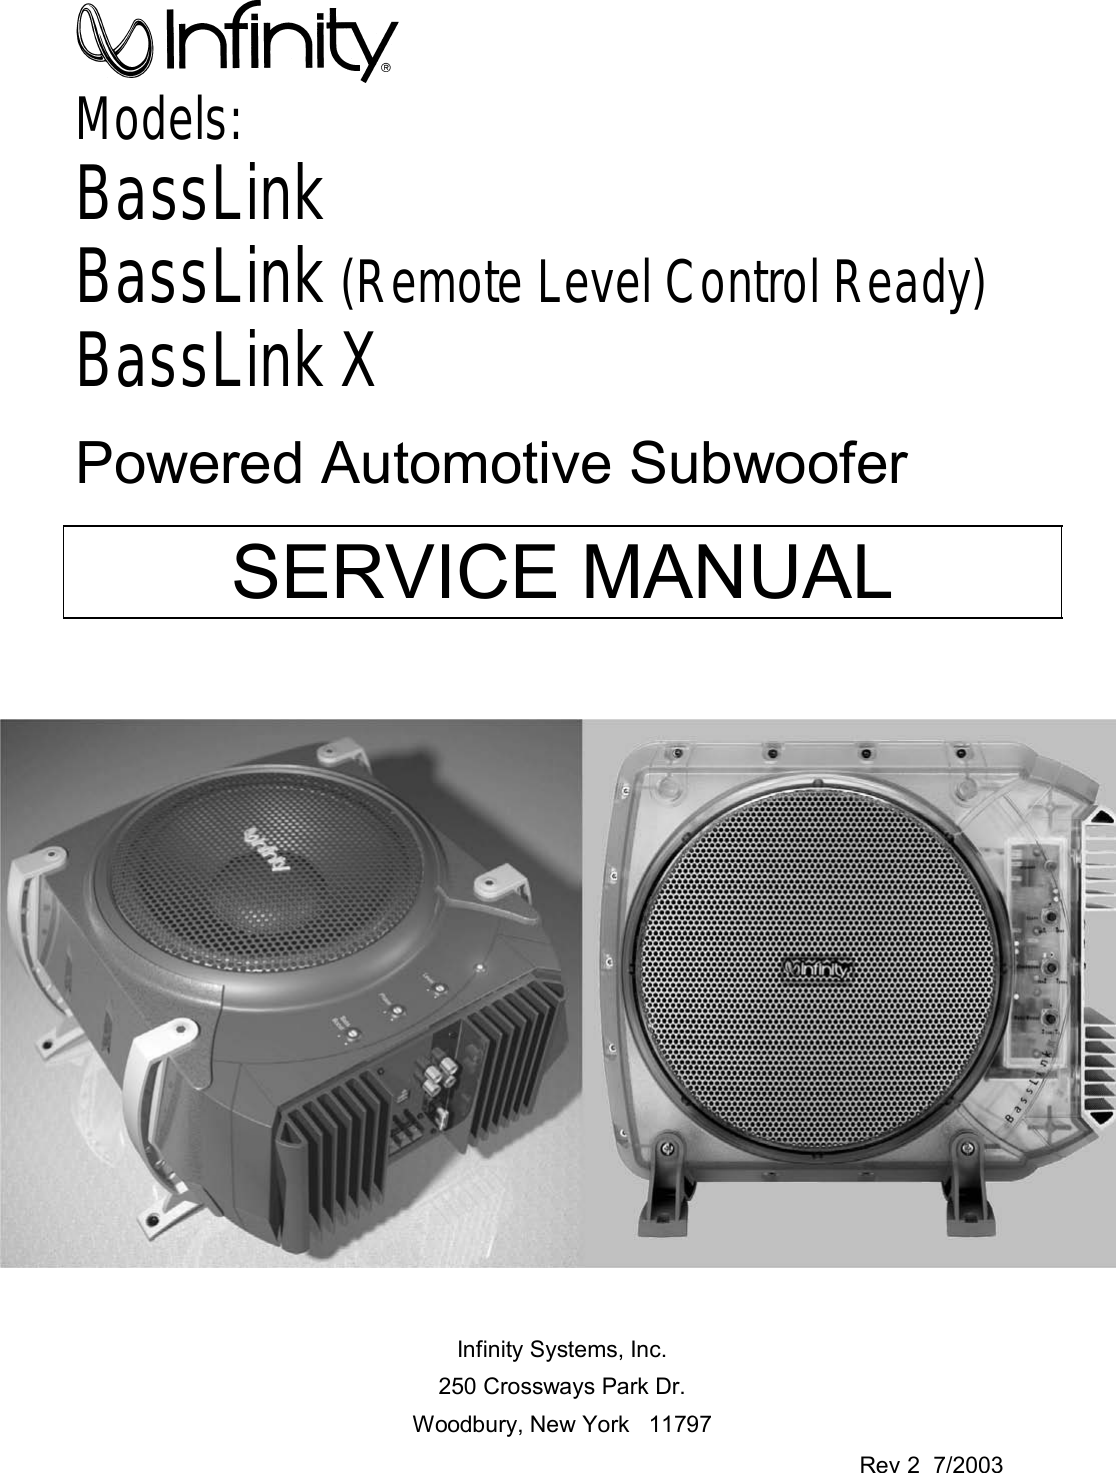 Infinity Basslink Manual Guide